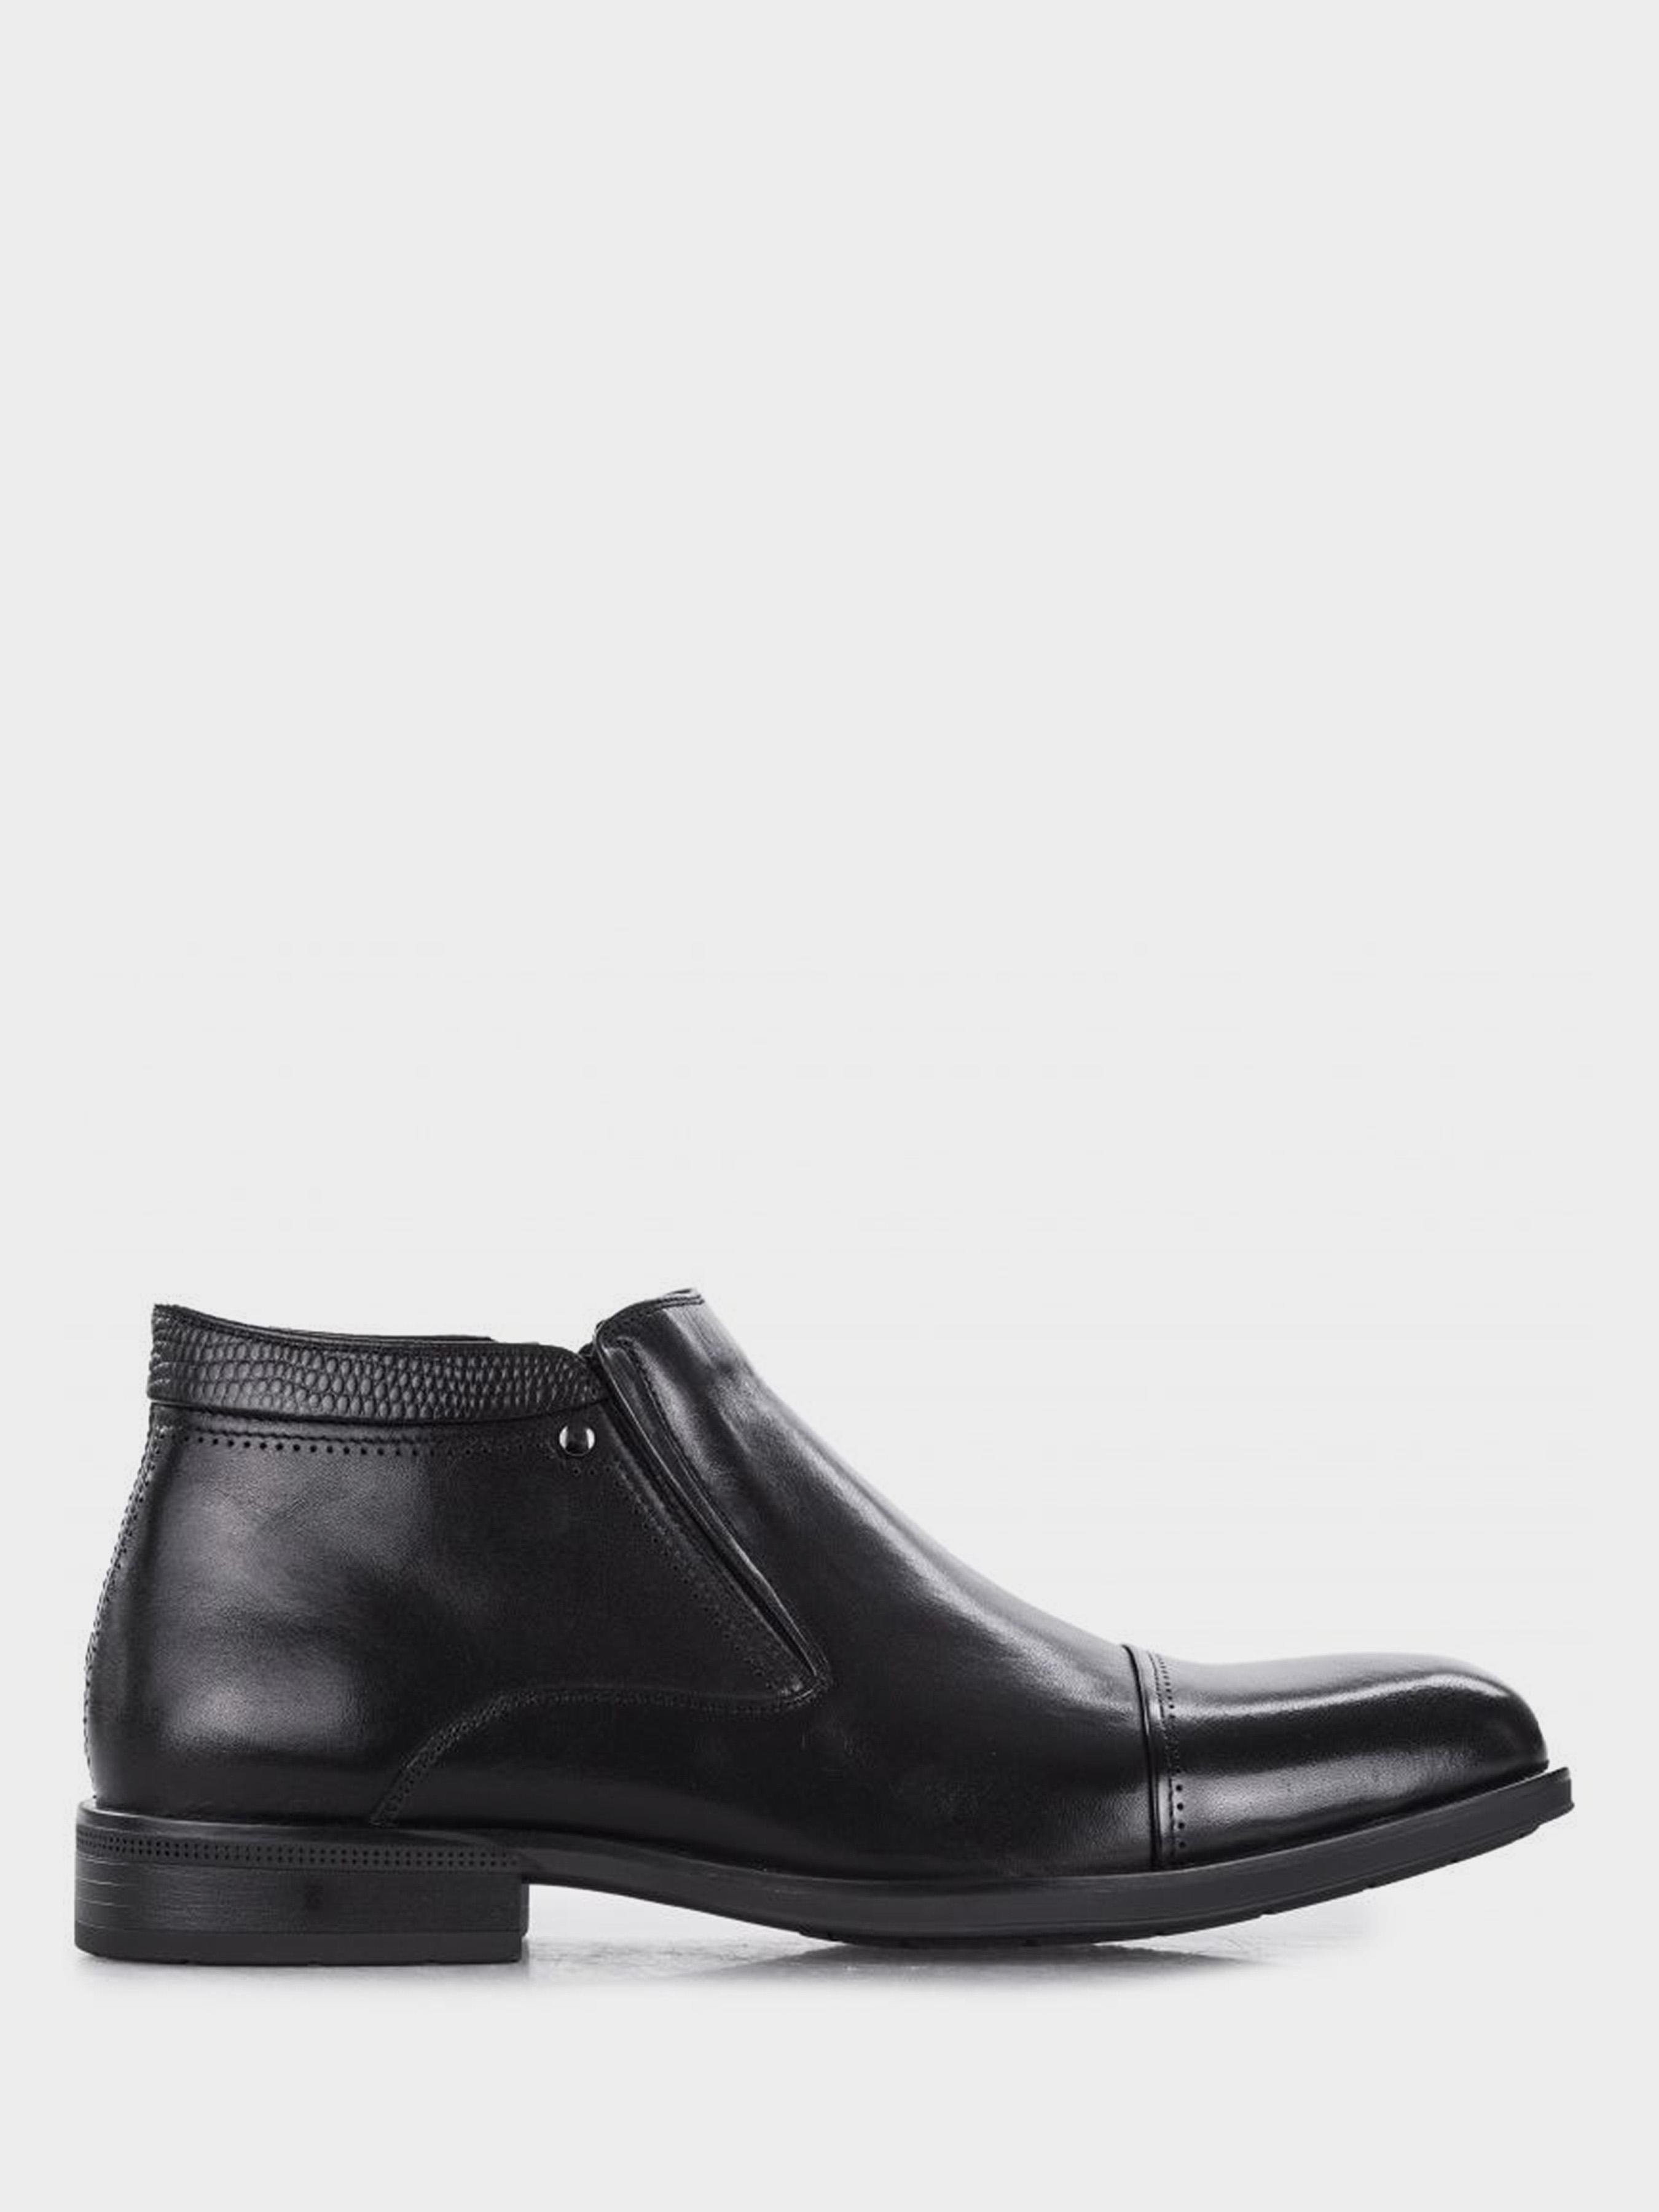 Ботинки для мужчин Braska BR1569 брендовые, 2017